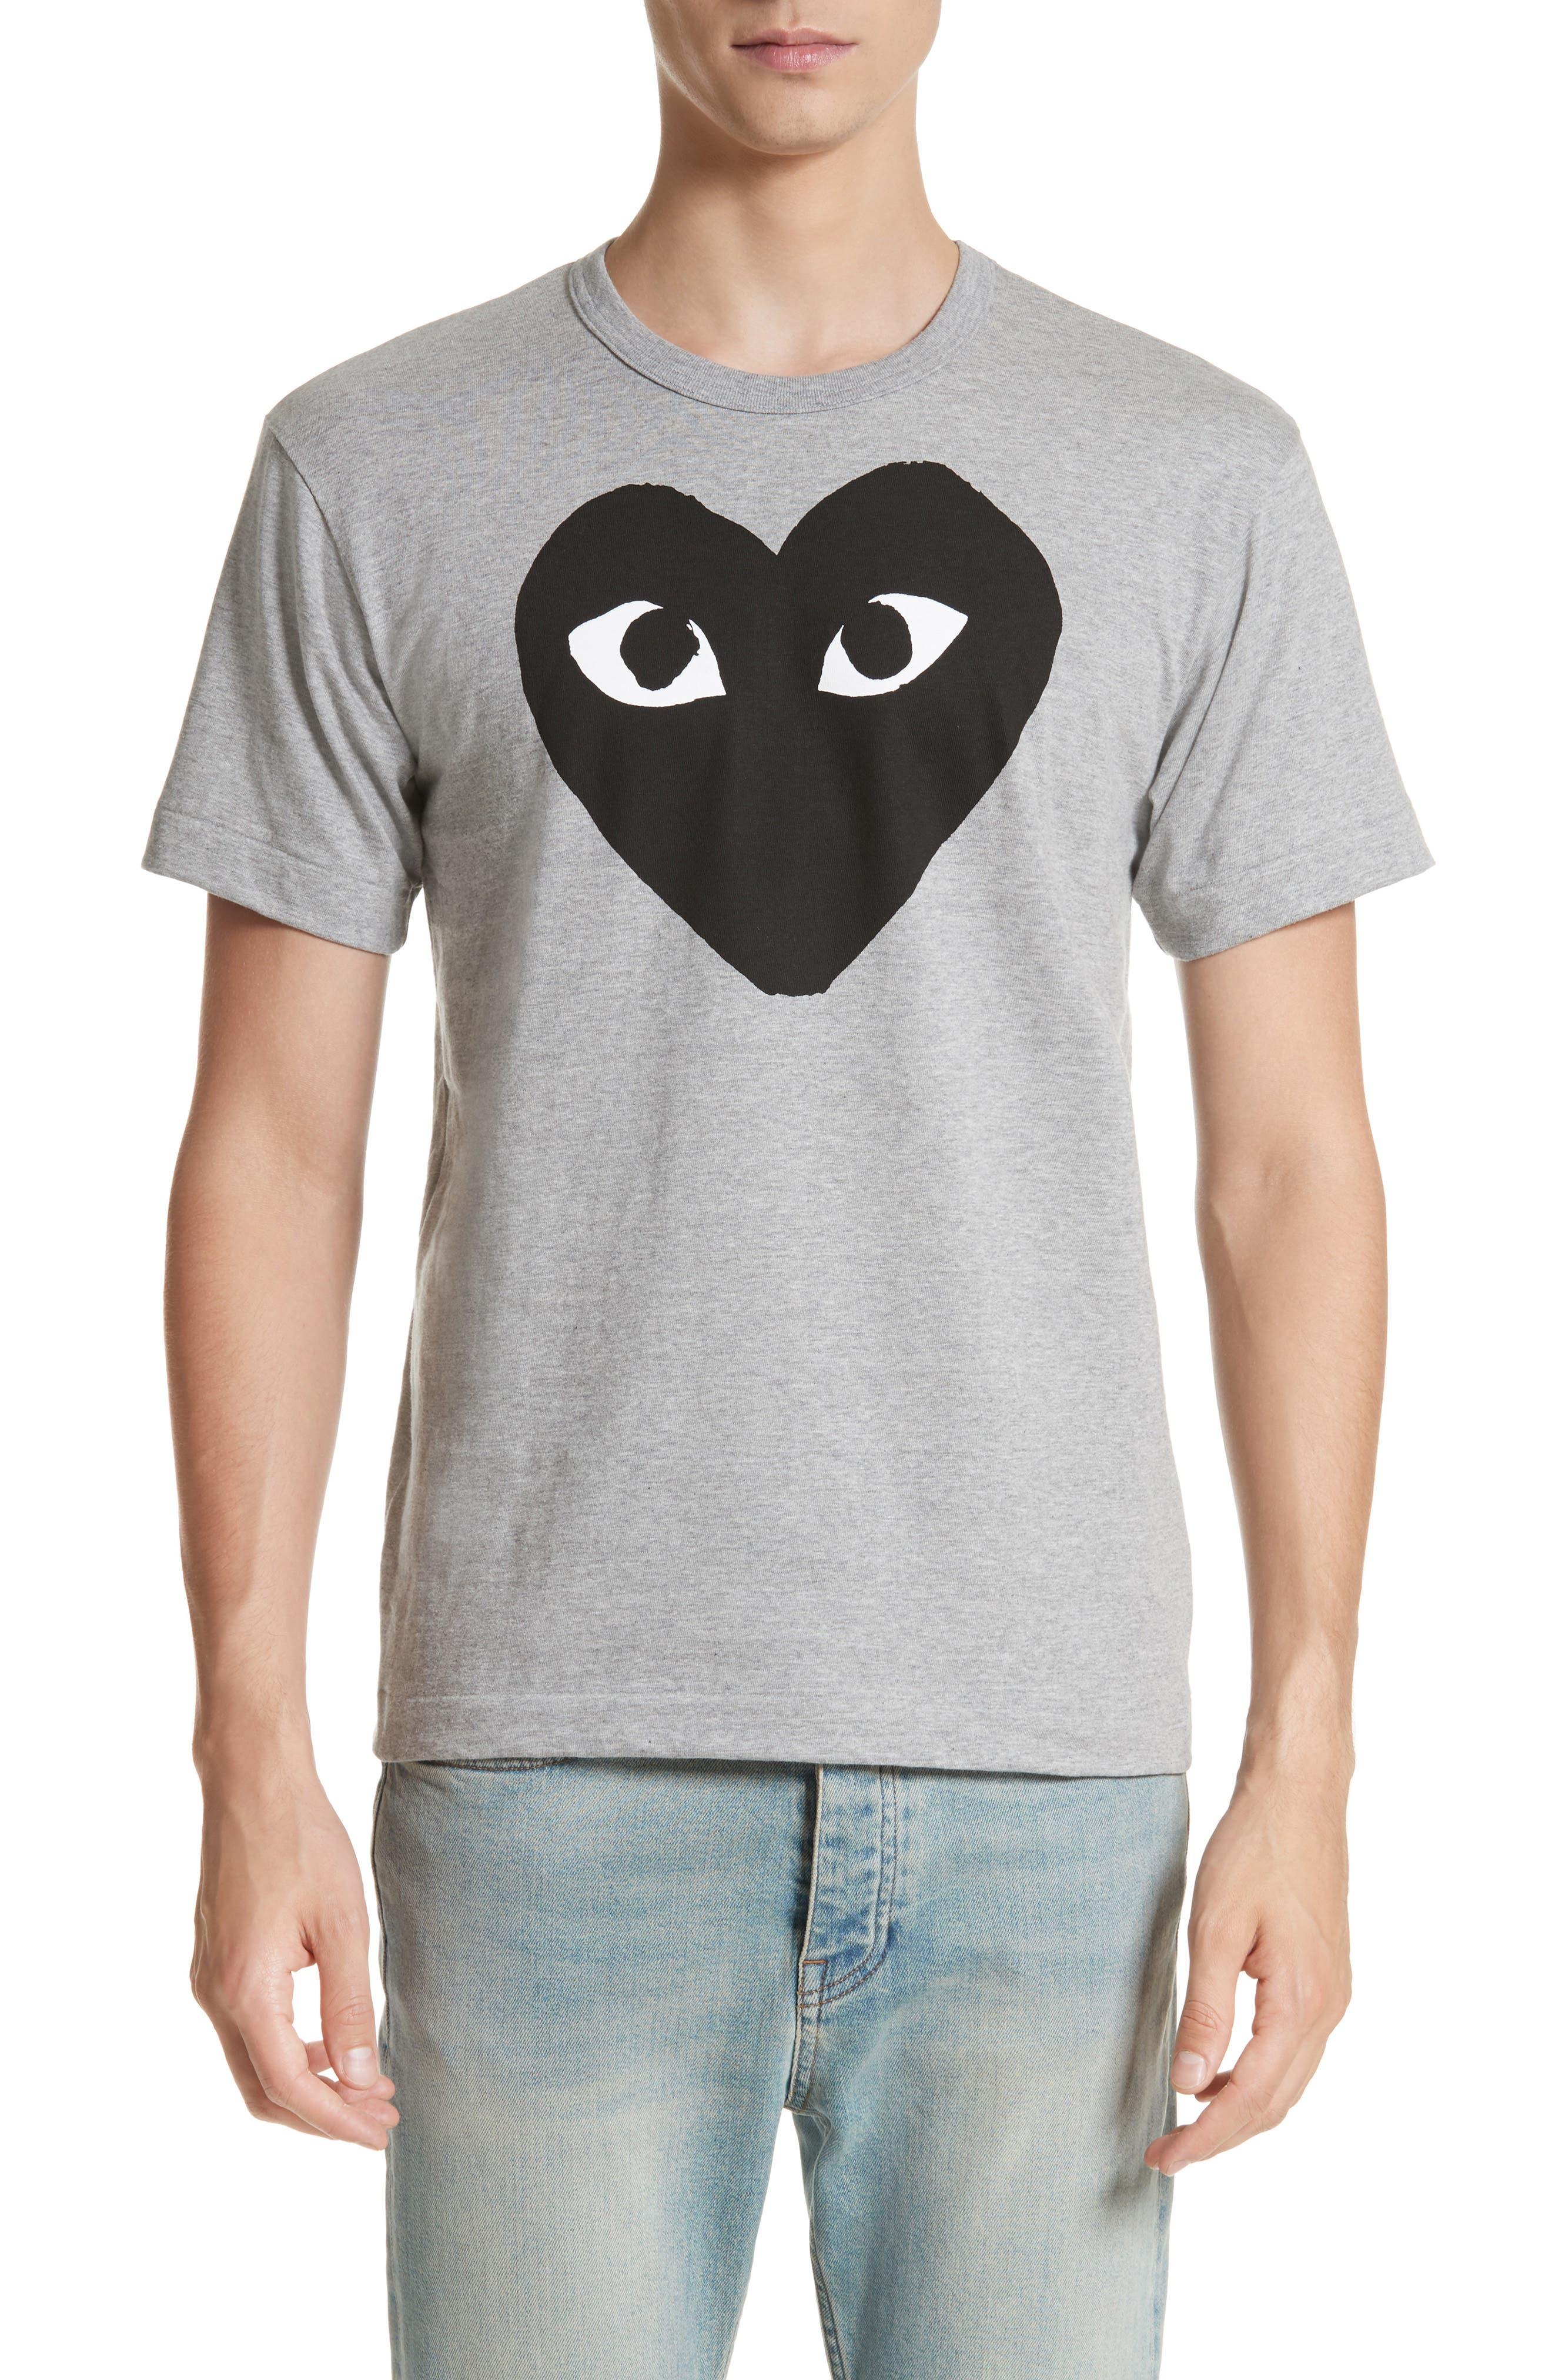 Logo Slim Fit Graphic Crewneck T-Shirt, Main, color, TOP DYED GRAY